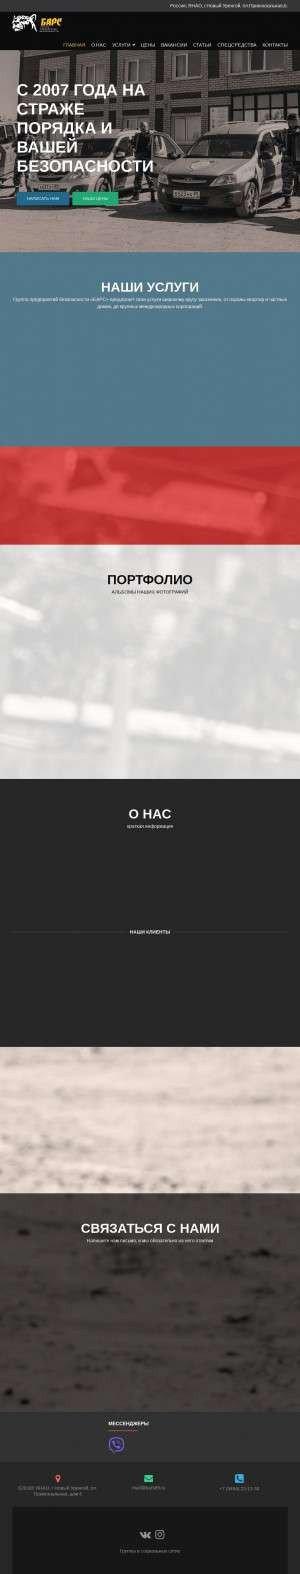 Предпросмотр для bars89.ru — Охранное предприятие Барс